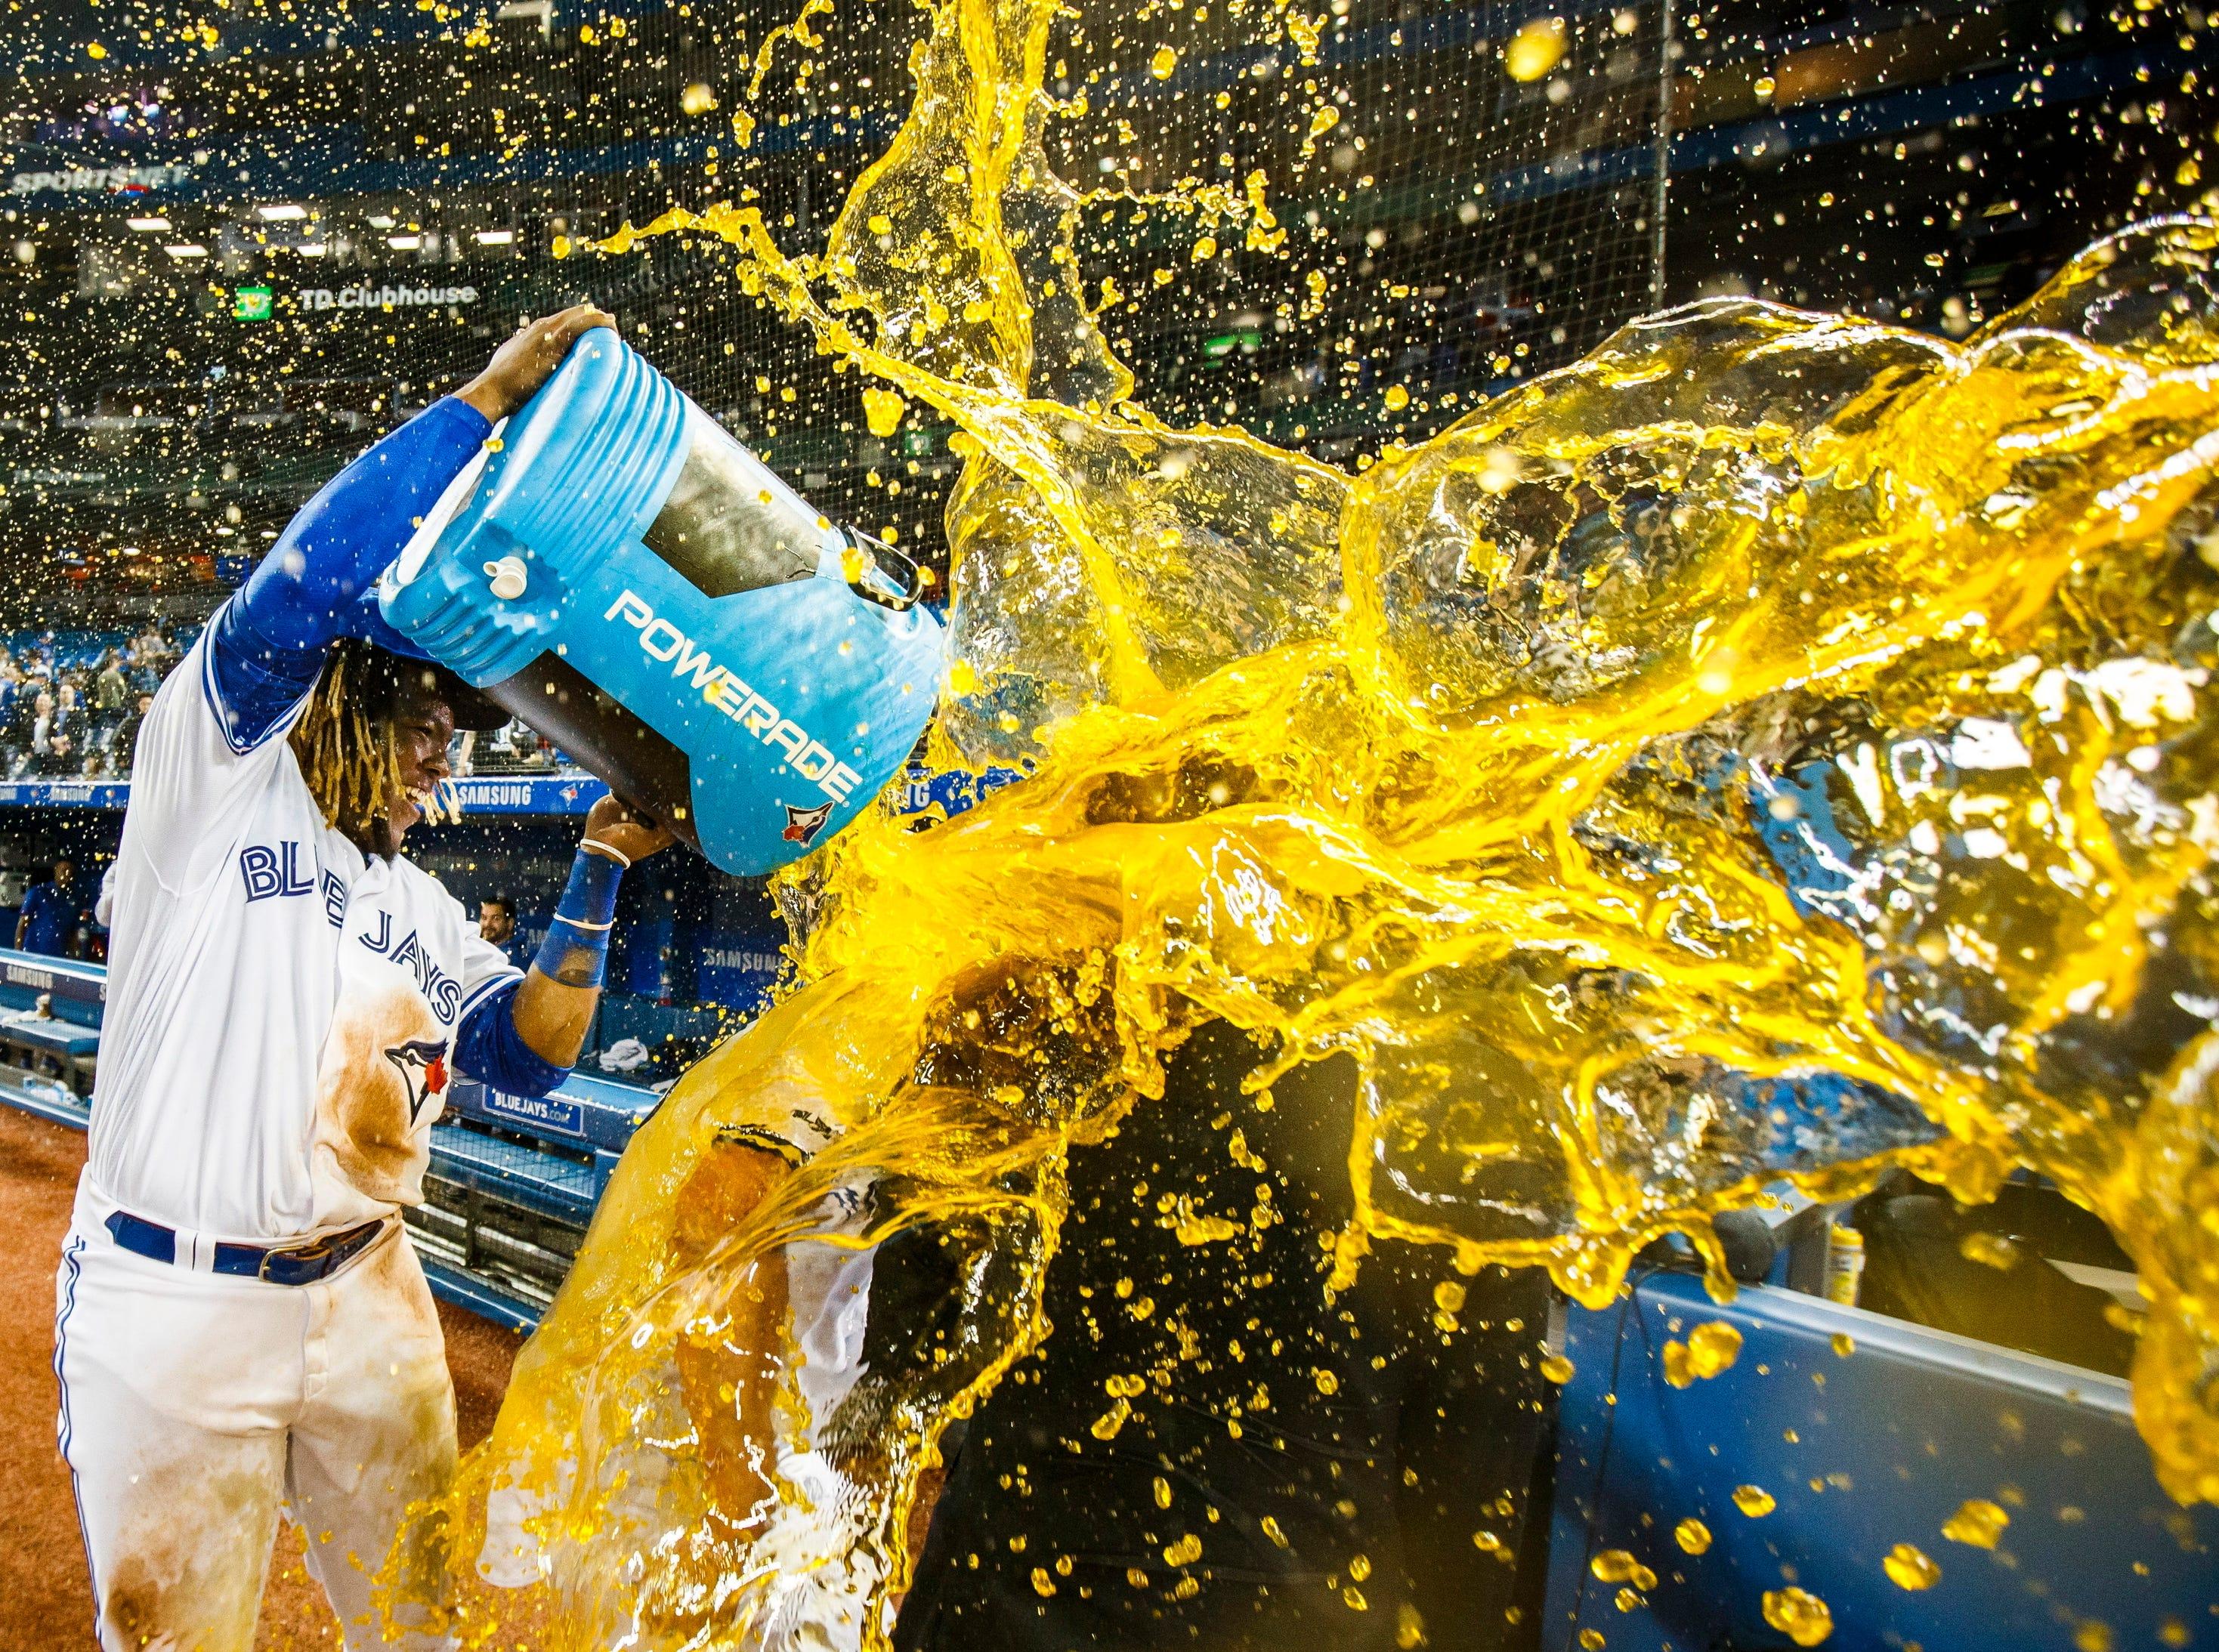 Toronto Blue Jays' Vladimir Guerrero Jr., left, douses teammate Brandon Drury after Drury's walkoff ninth-inning home run to defeat the Oakland Athletics in Toronto, Friday, April 26, 2019.